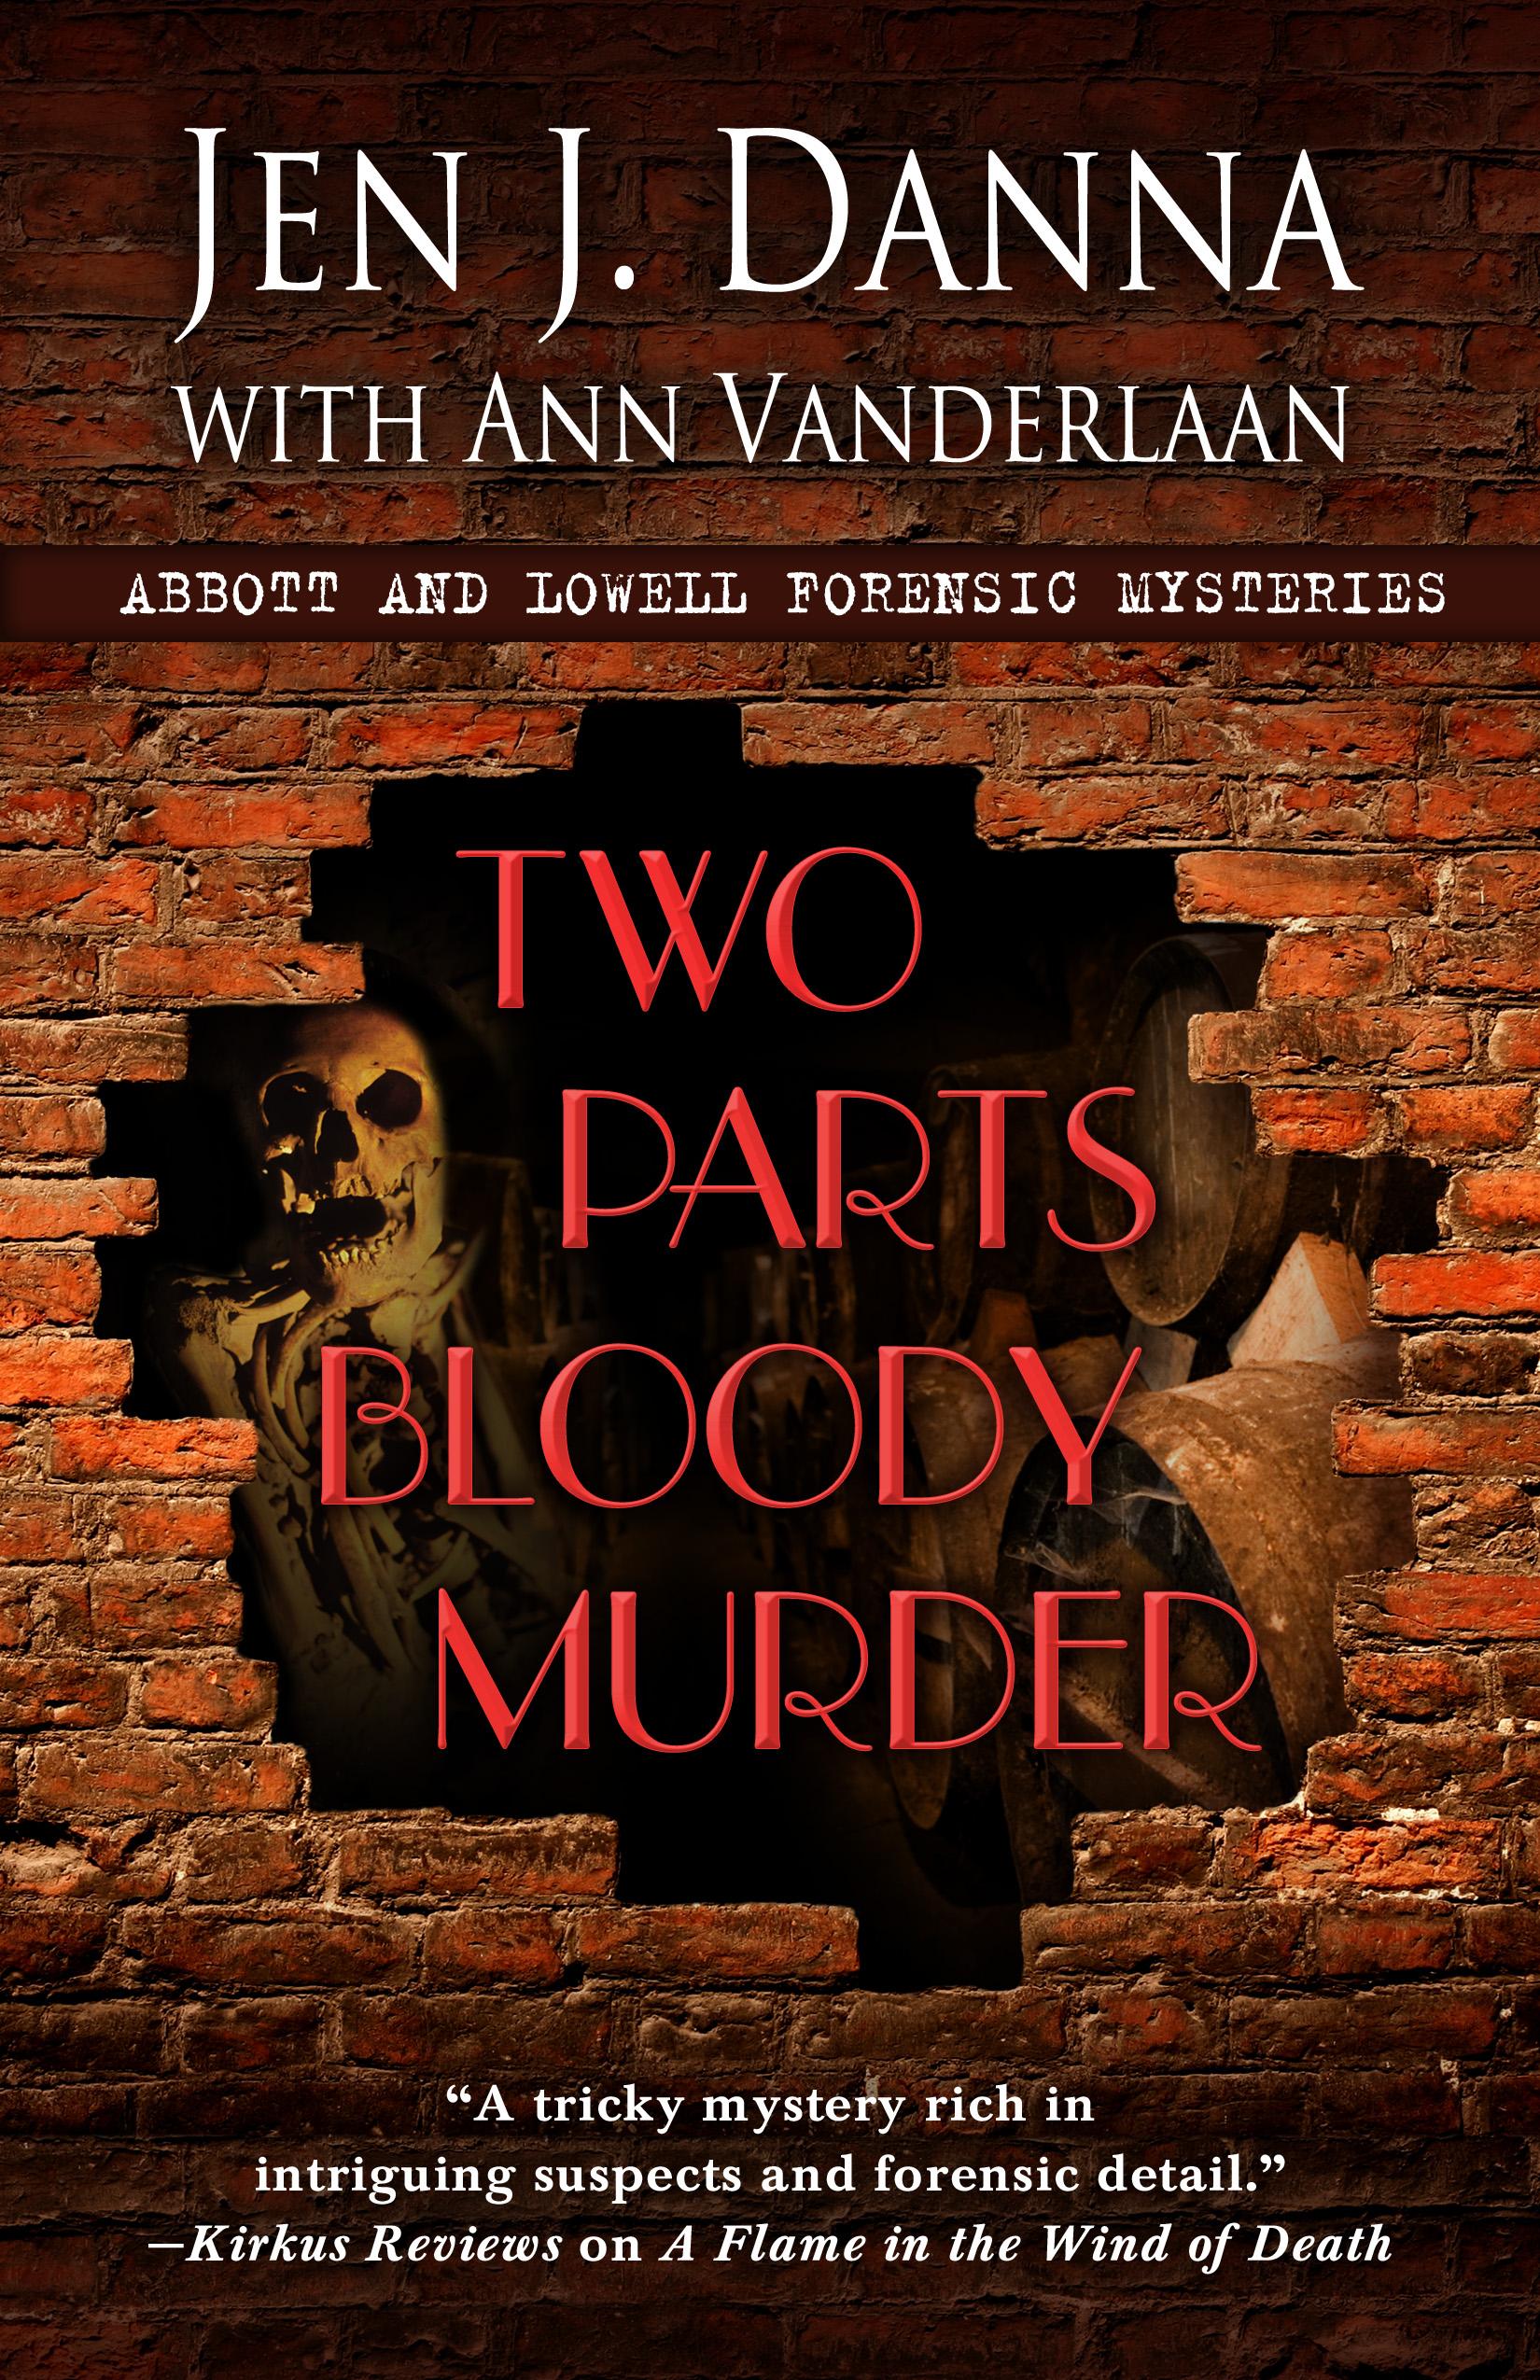 Original Five Star Publishing hardcover and e-book cover art